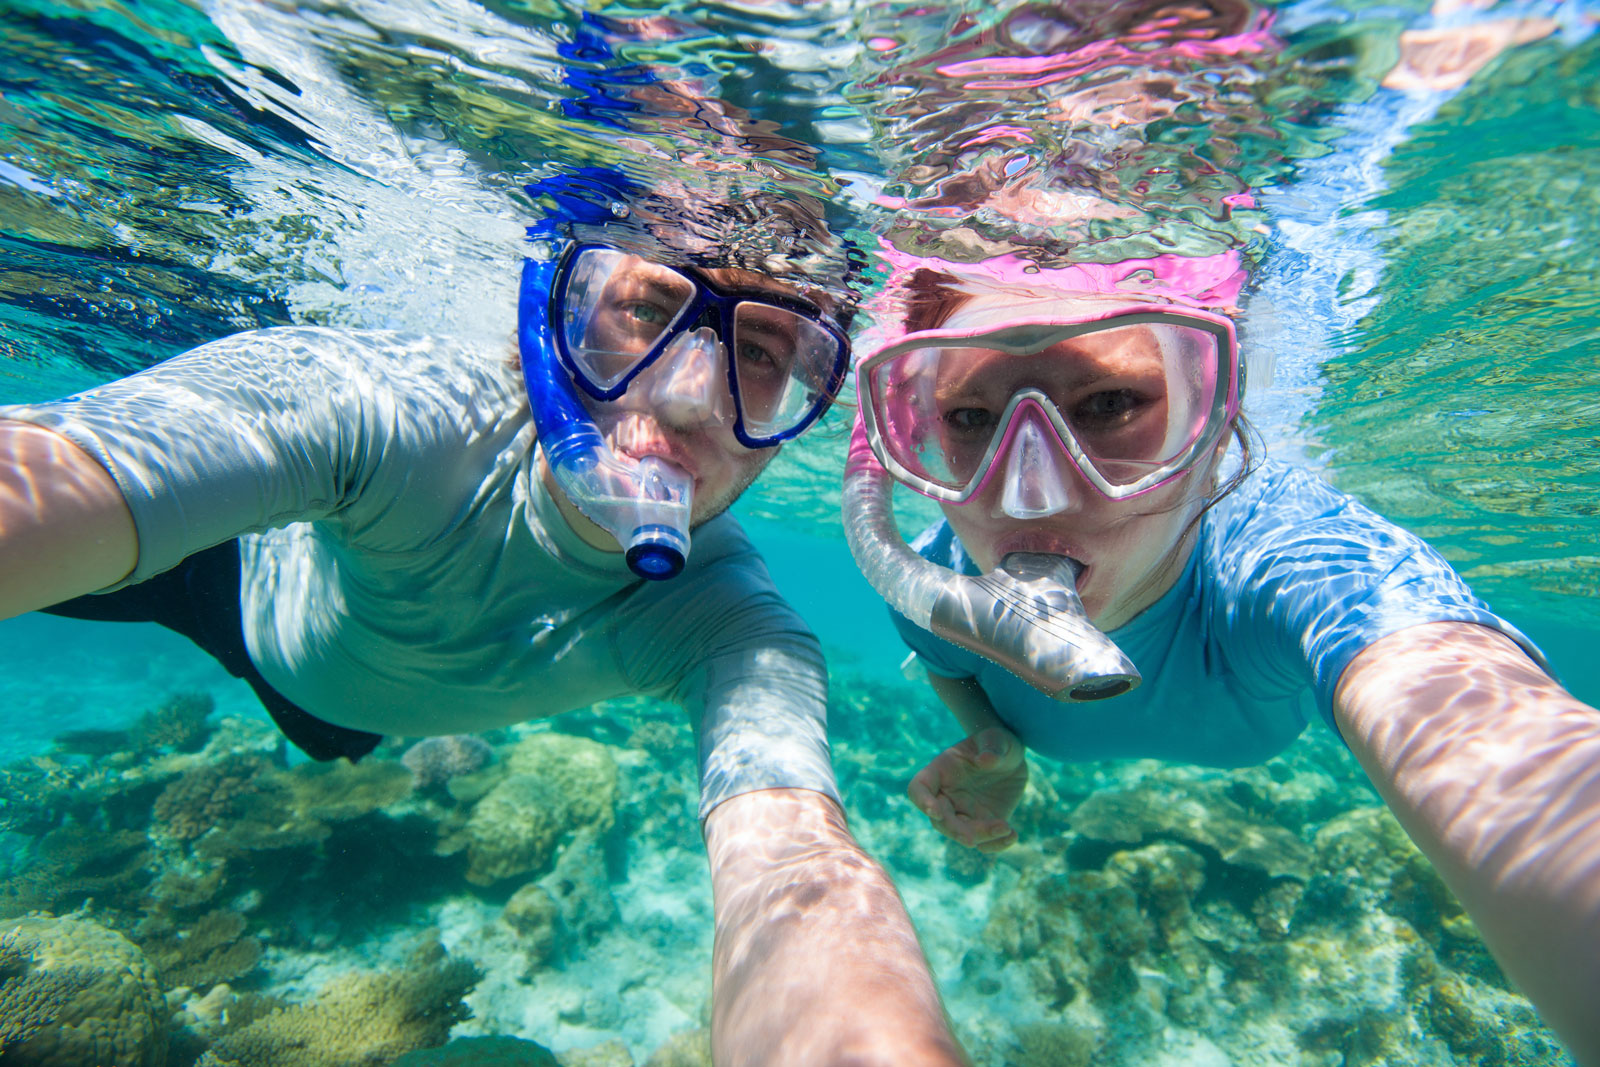 Hawaii Honeymoon: Your Guide to An Unforgettable Honeymoon